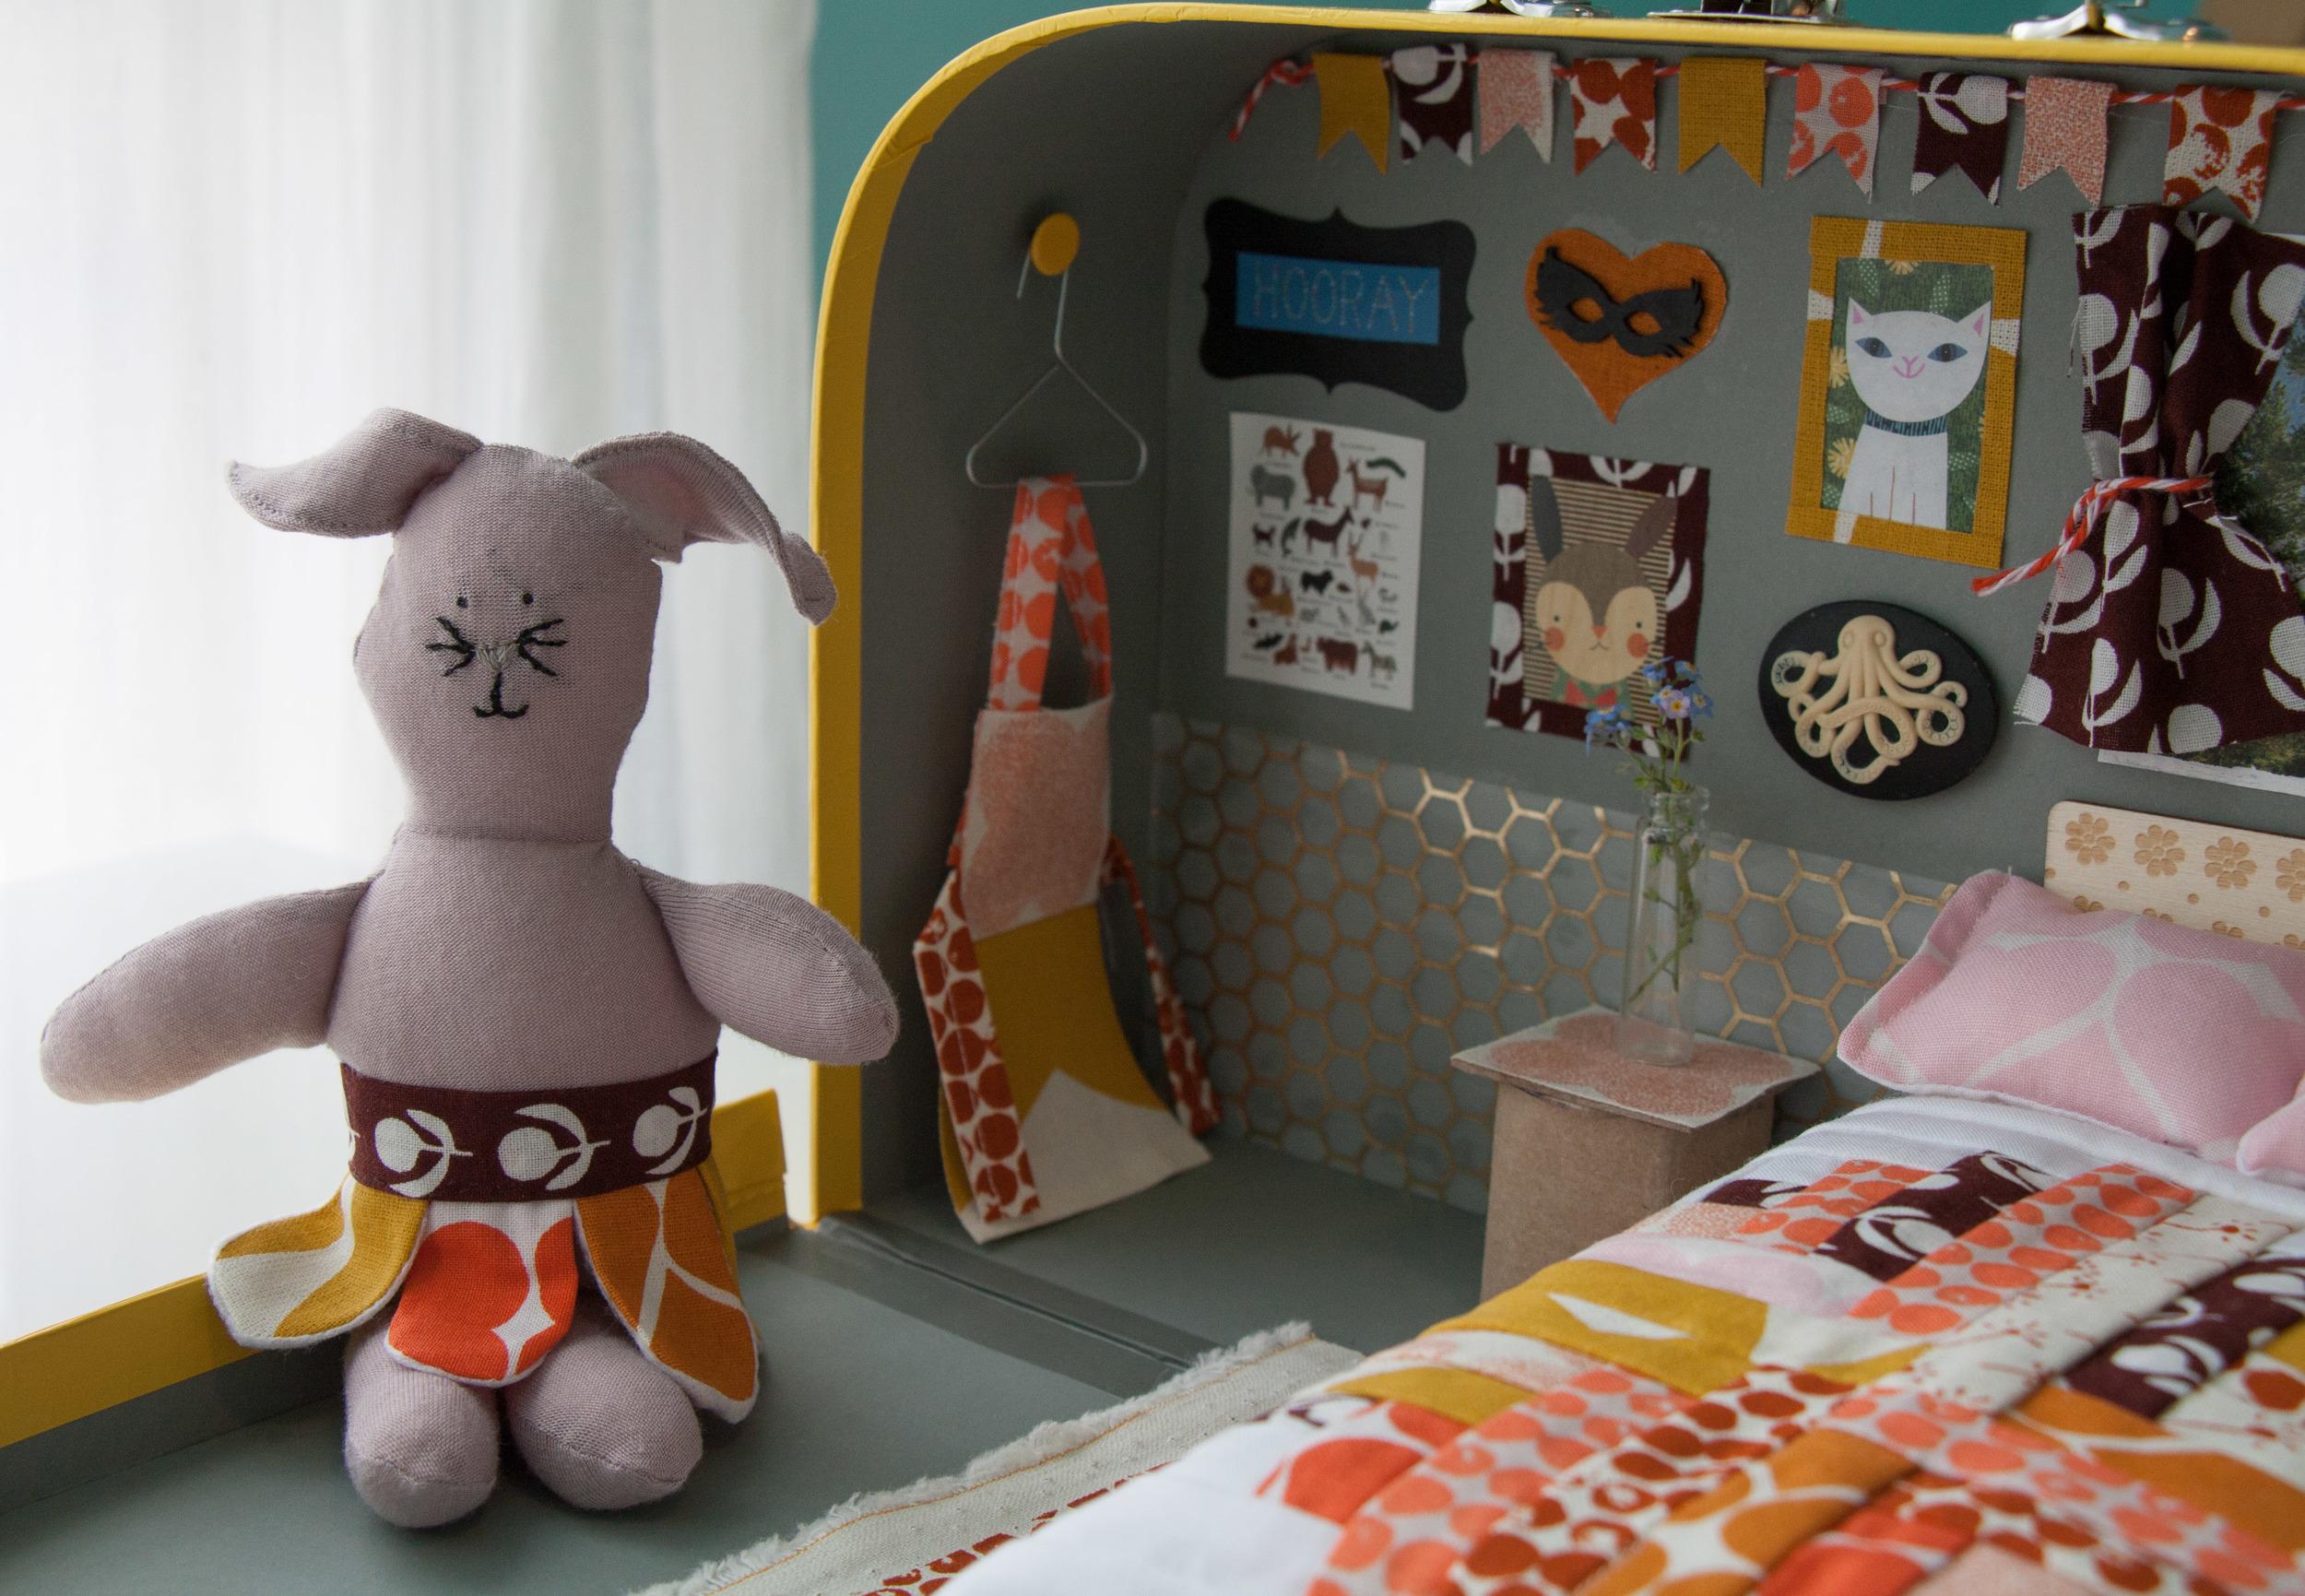 Hooray for Rain - rabbit in room.jpg